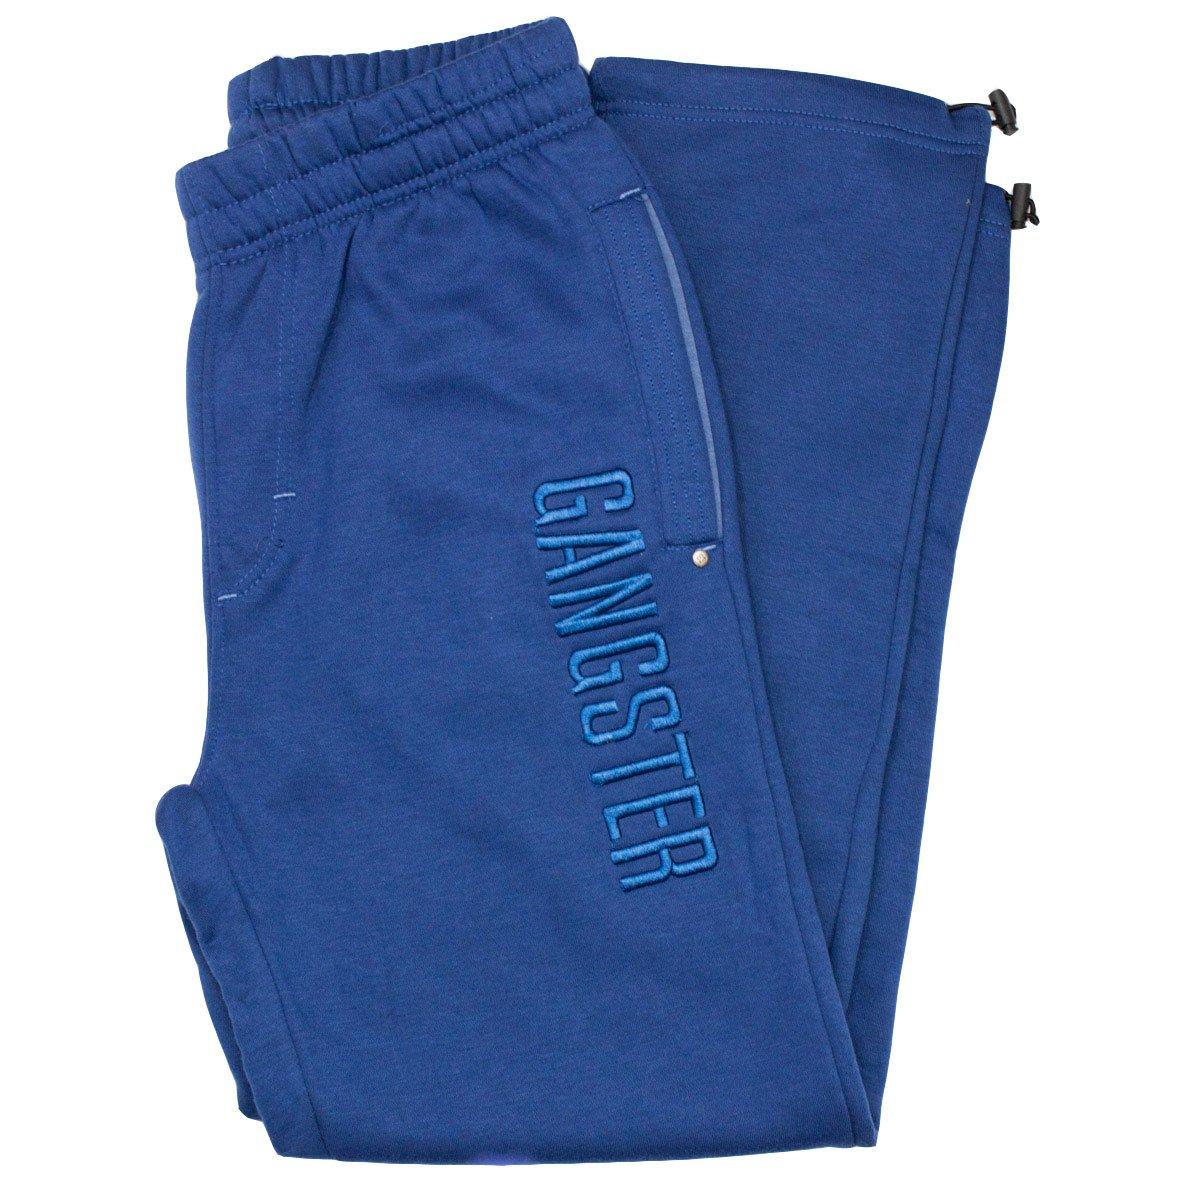 Bizz Store - Calça Masculina Gangster Moletom Azul Cinza 024d855153c52